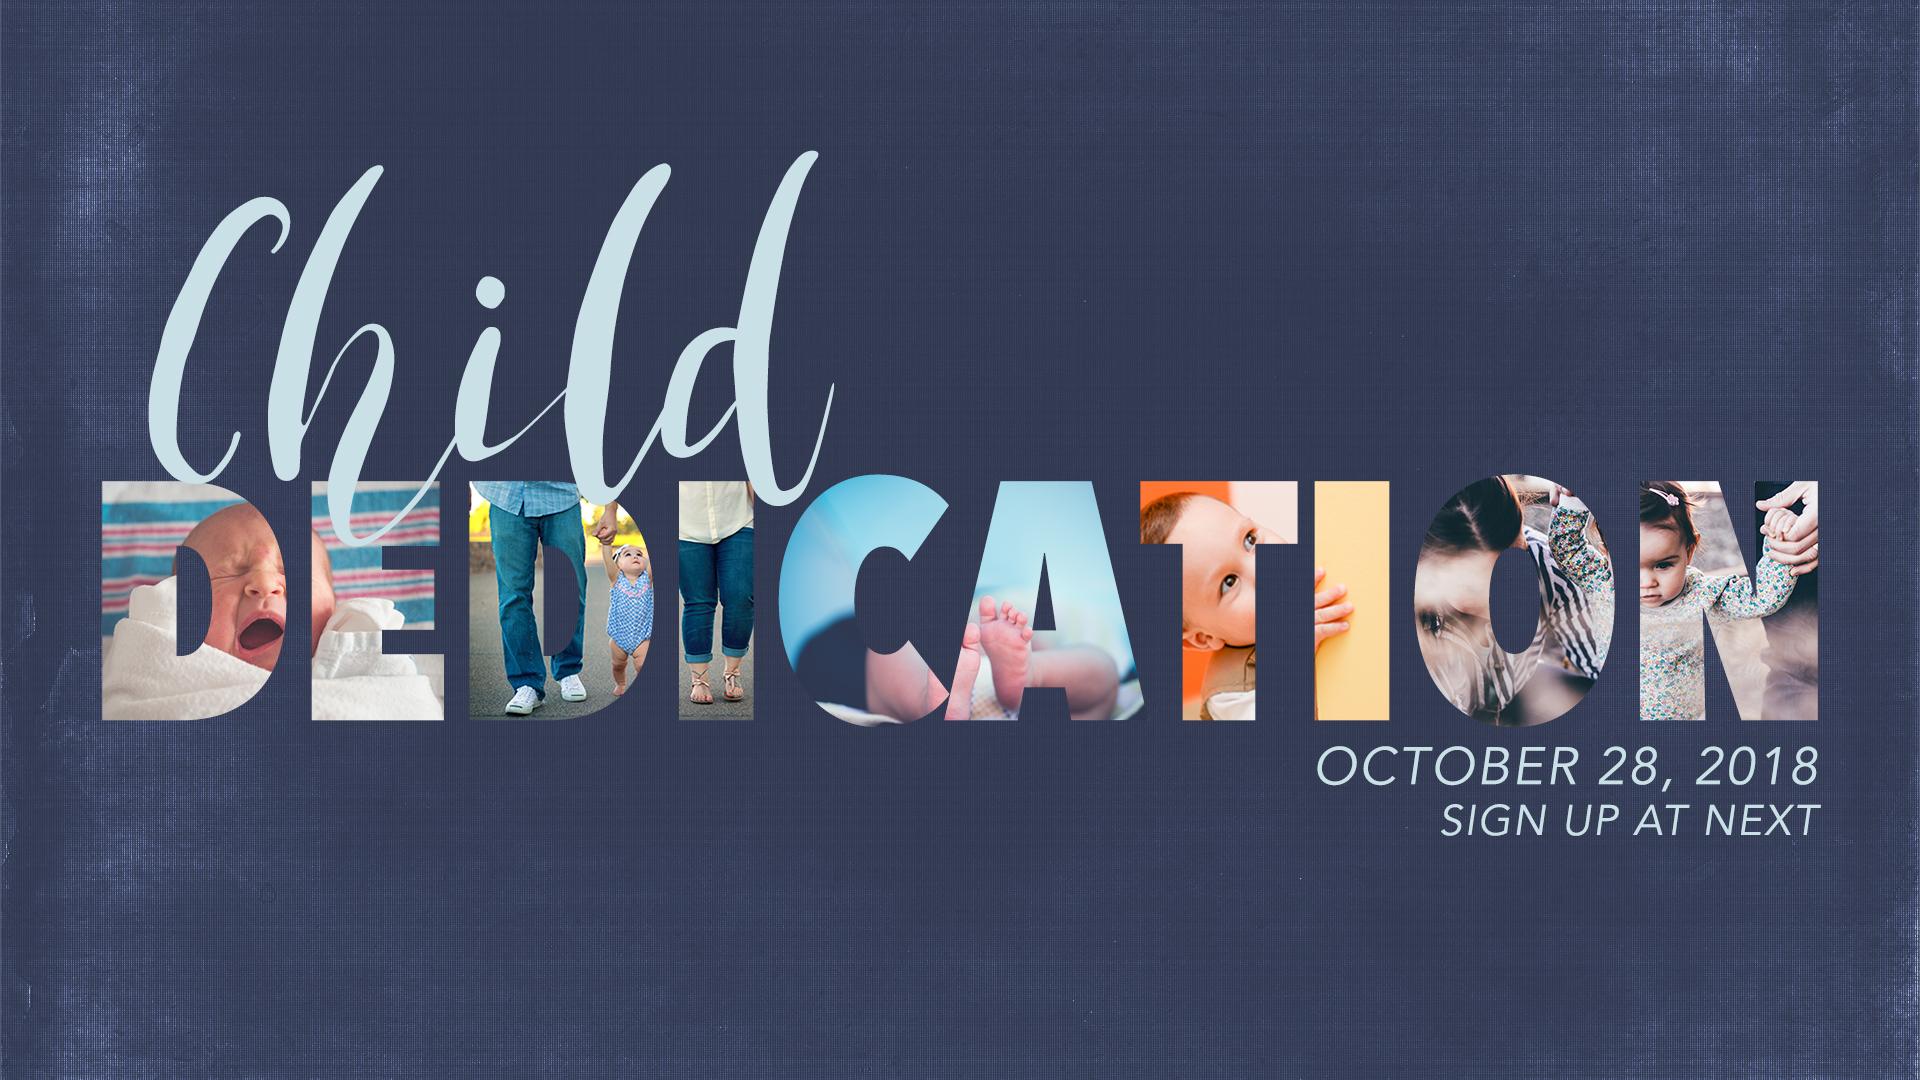 Child Dedications happening at all locations.  Deadline for registration is October 19.